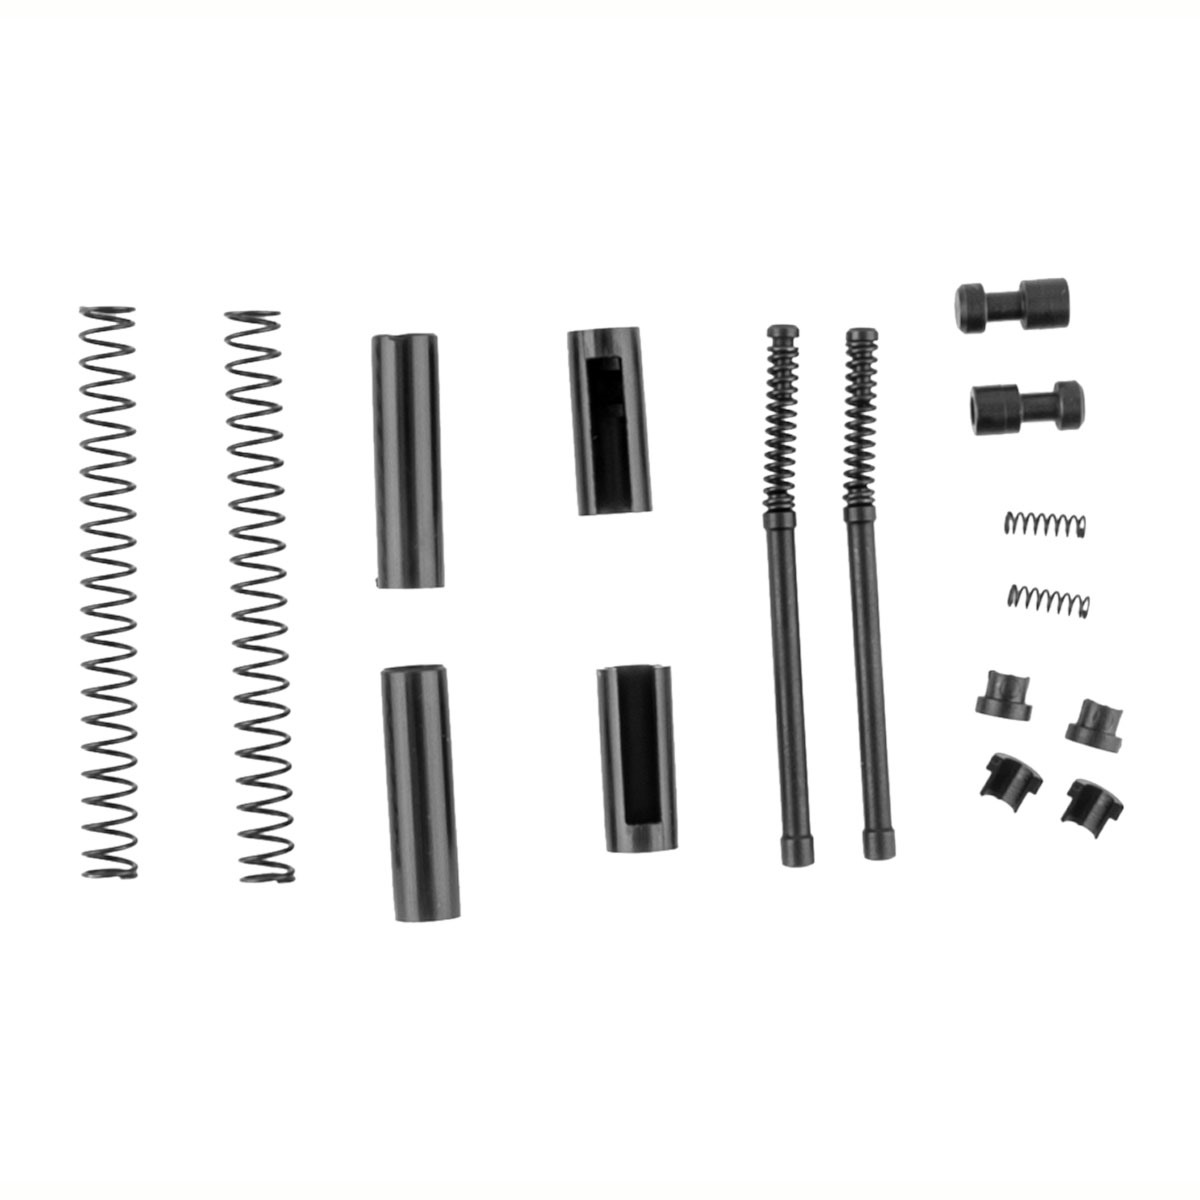 Ke Arms Llc Glock Slide Service Kit